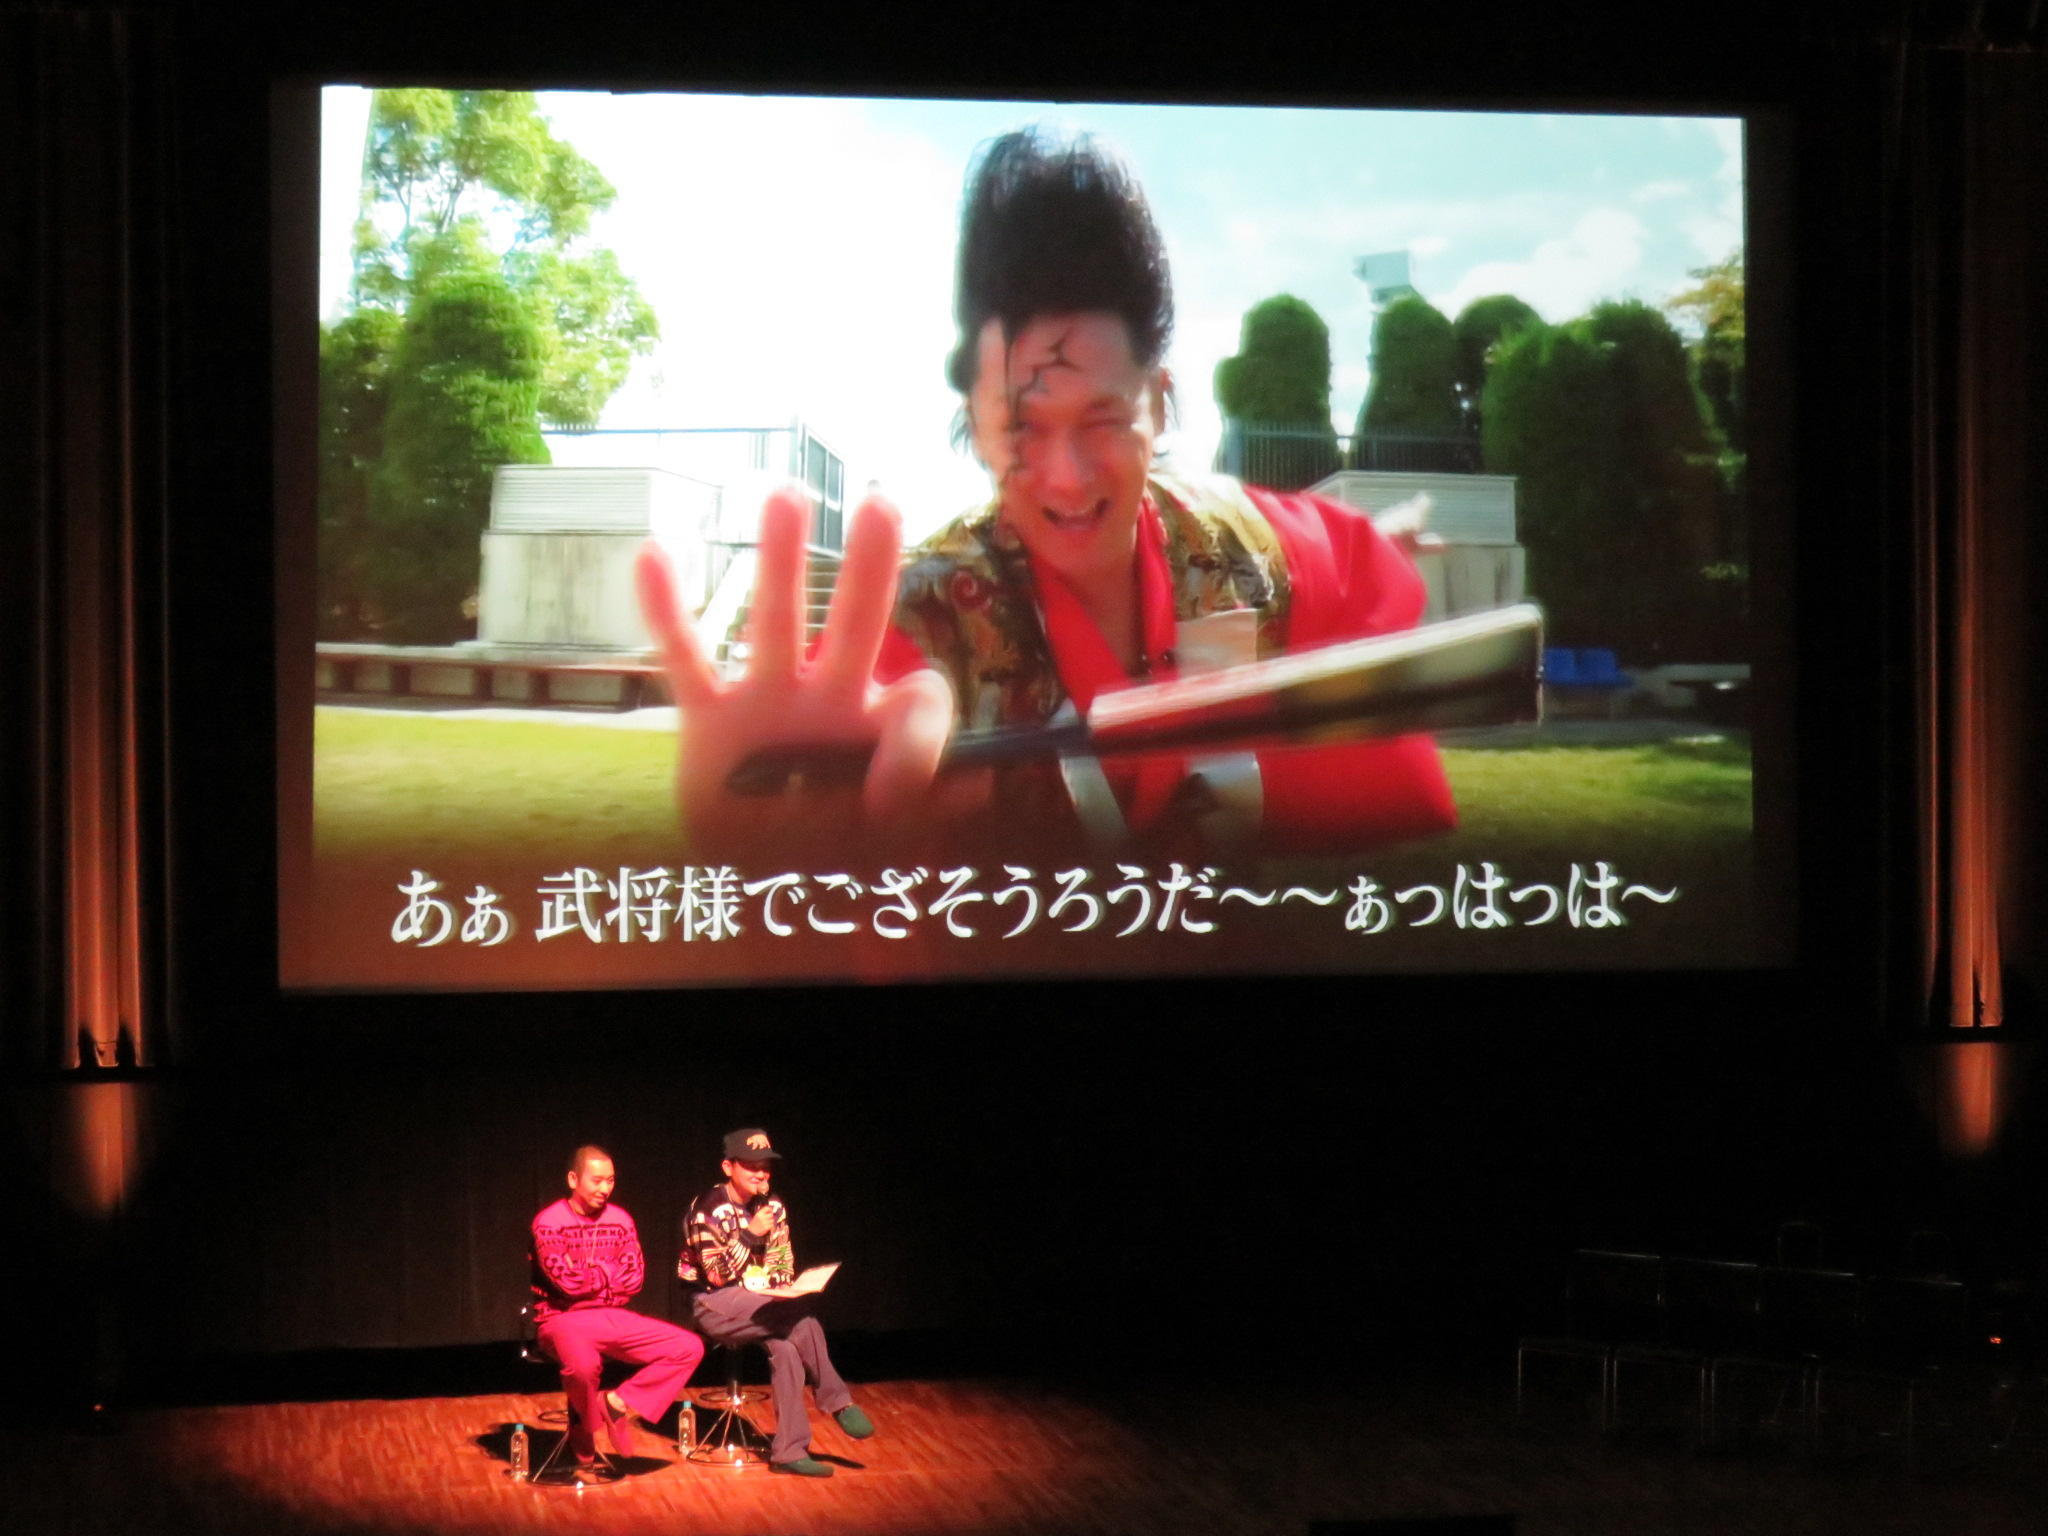 http://news.yoshimoto.co.jp/20181229113415-e986ca2cea00cb39a92cdeebc90db9cd8d3d0de3.jpg